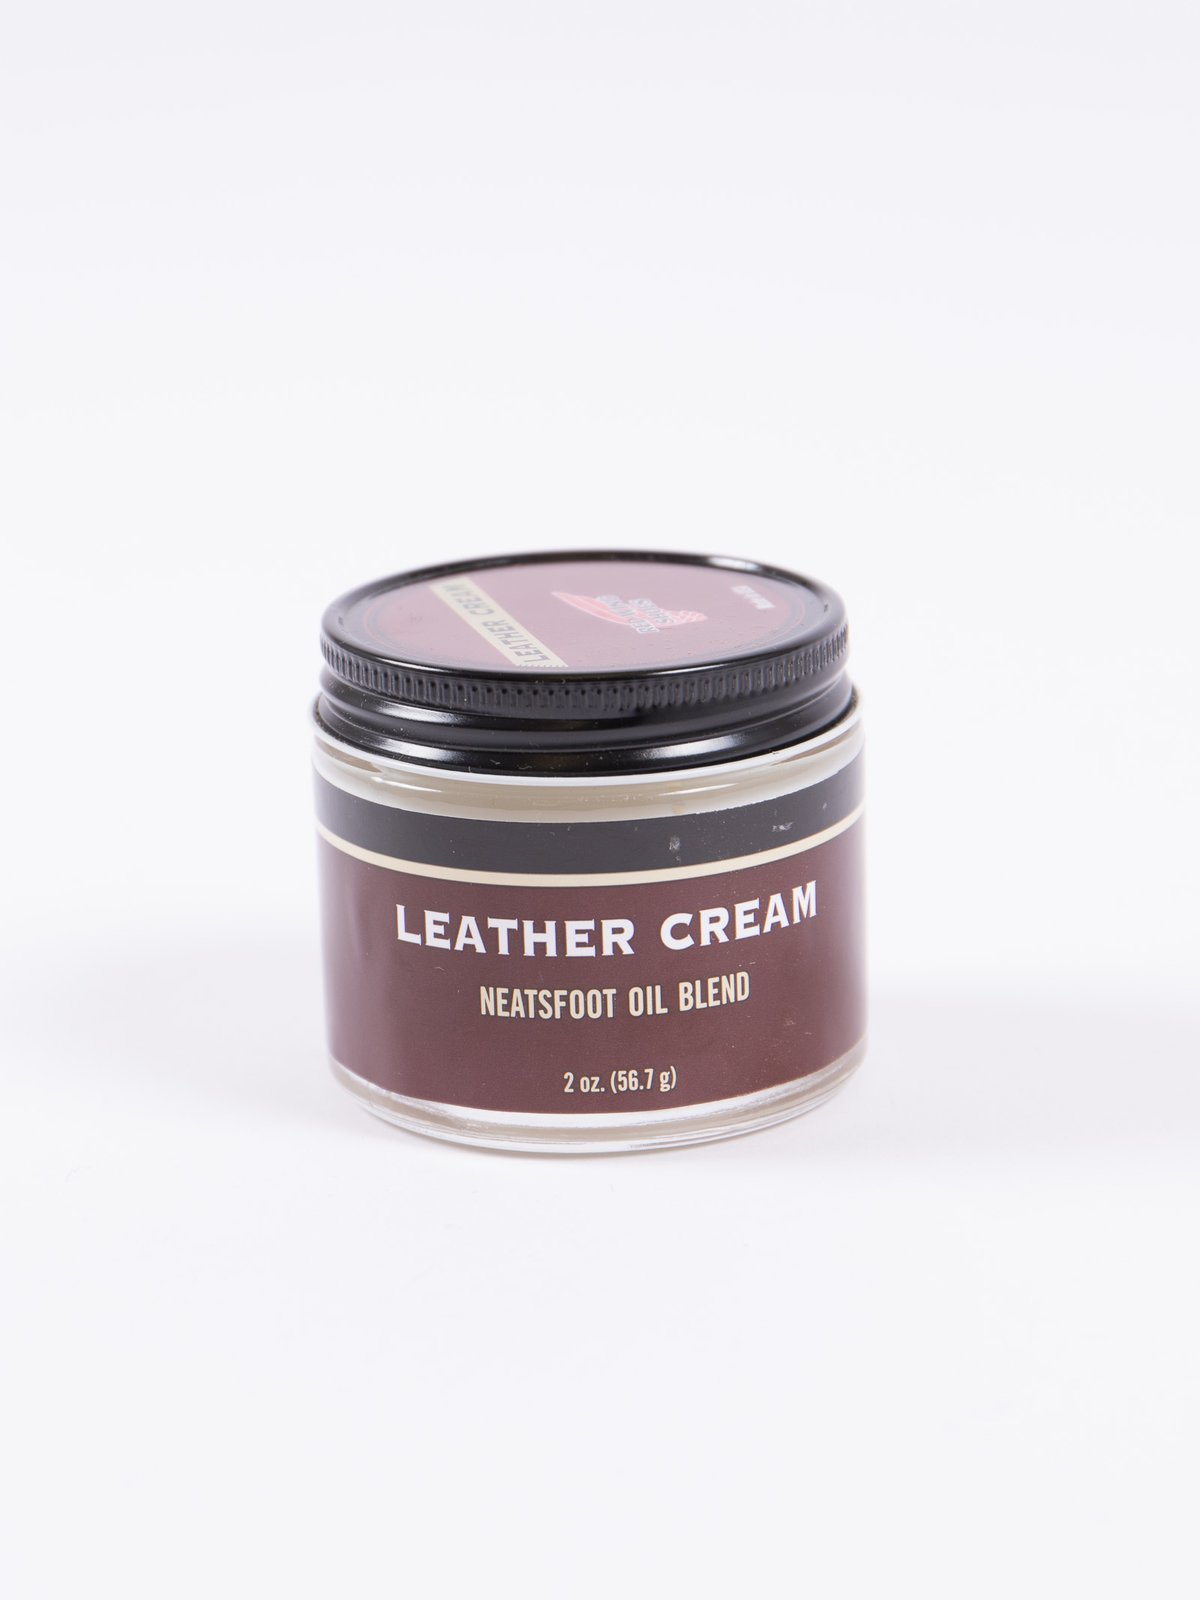 Leather Cream - Image 2